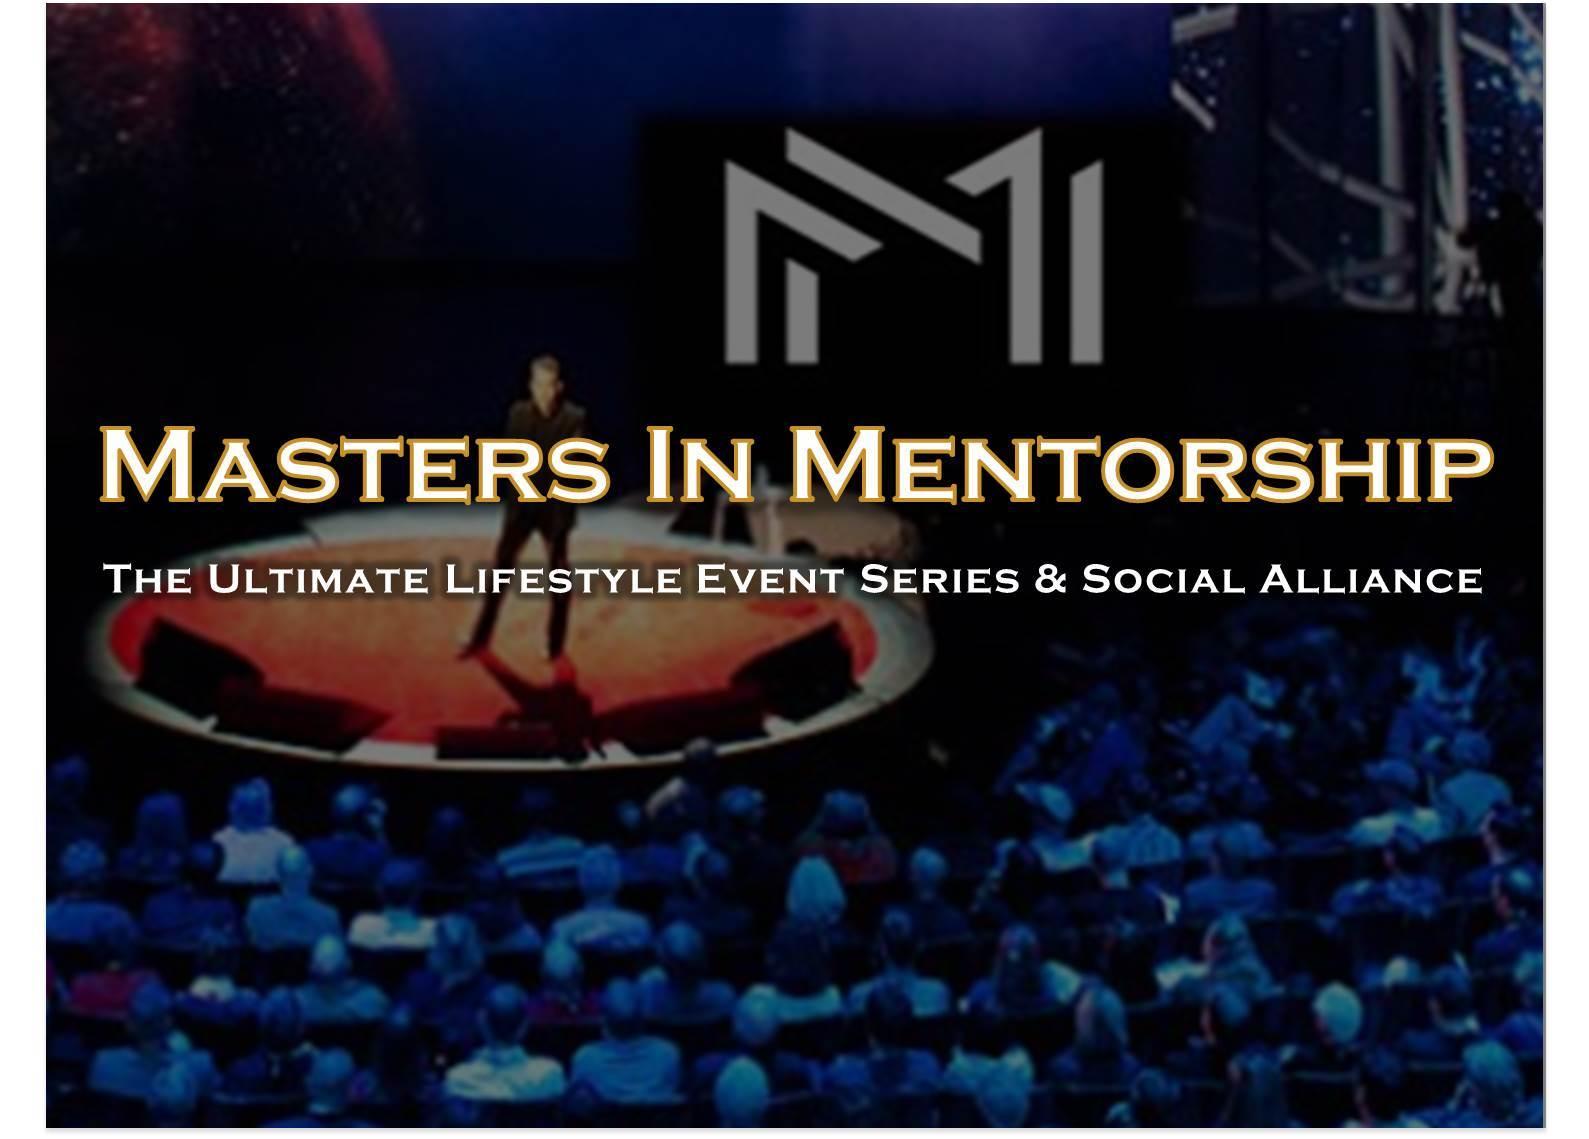 Masters In Mentorship Shop - A Mentorship Initiative Store